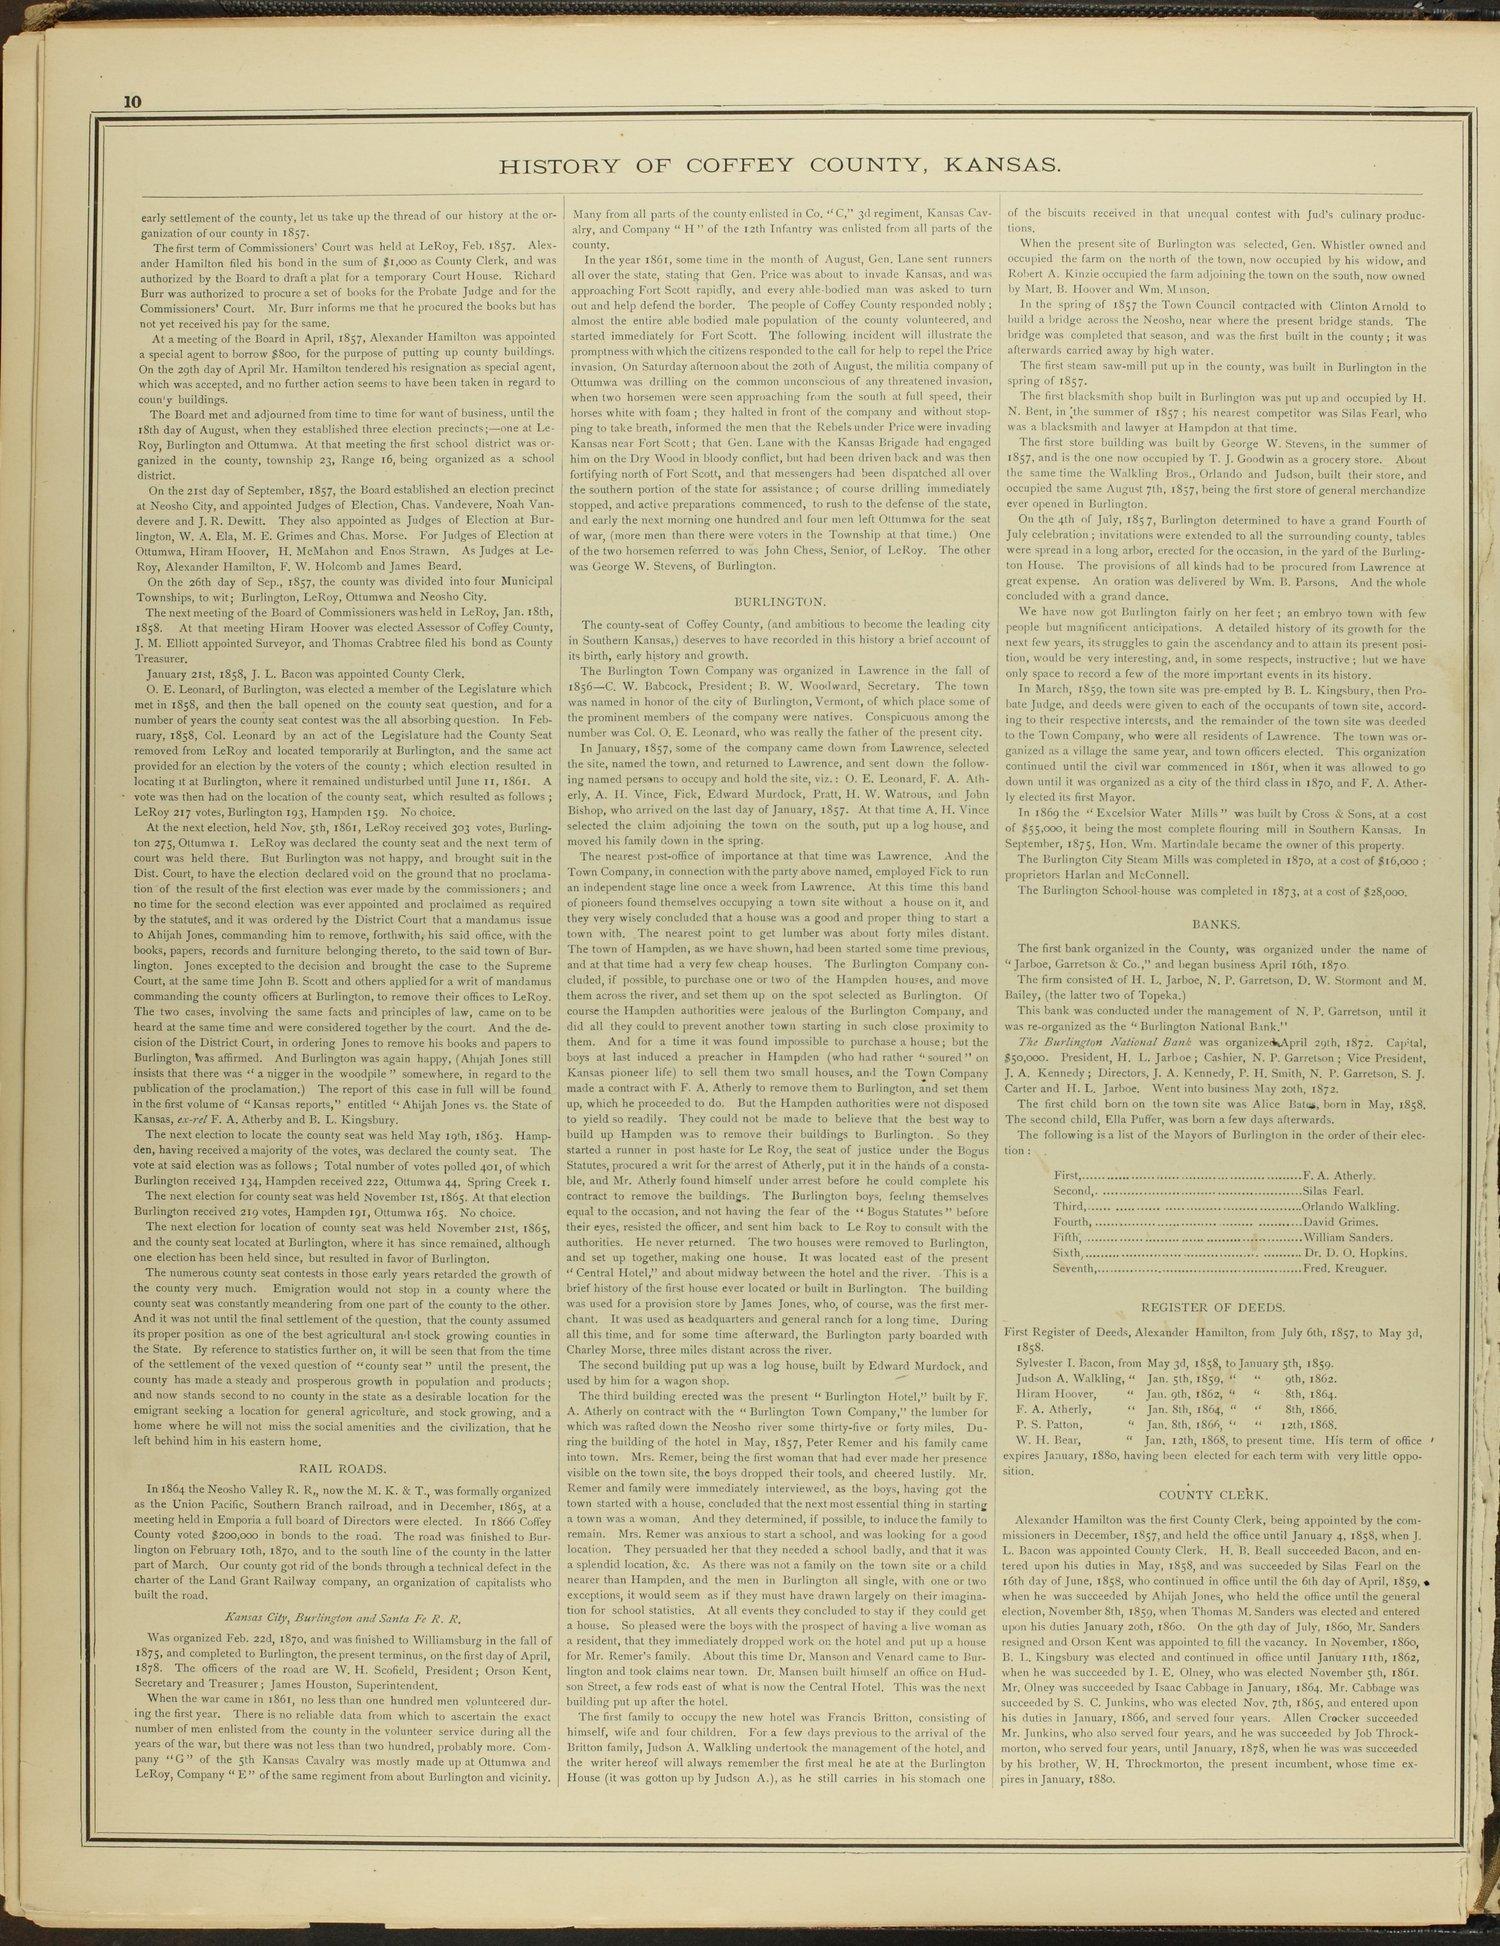 An illustrated historical atlas of Coffey County, Kansas - 10